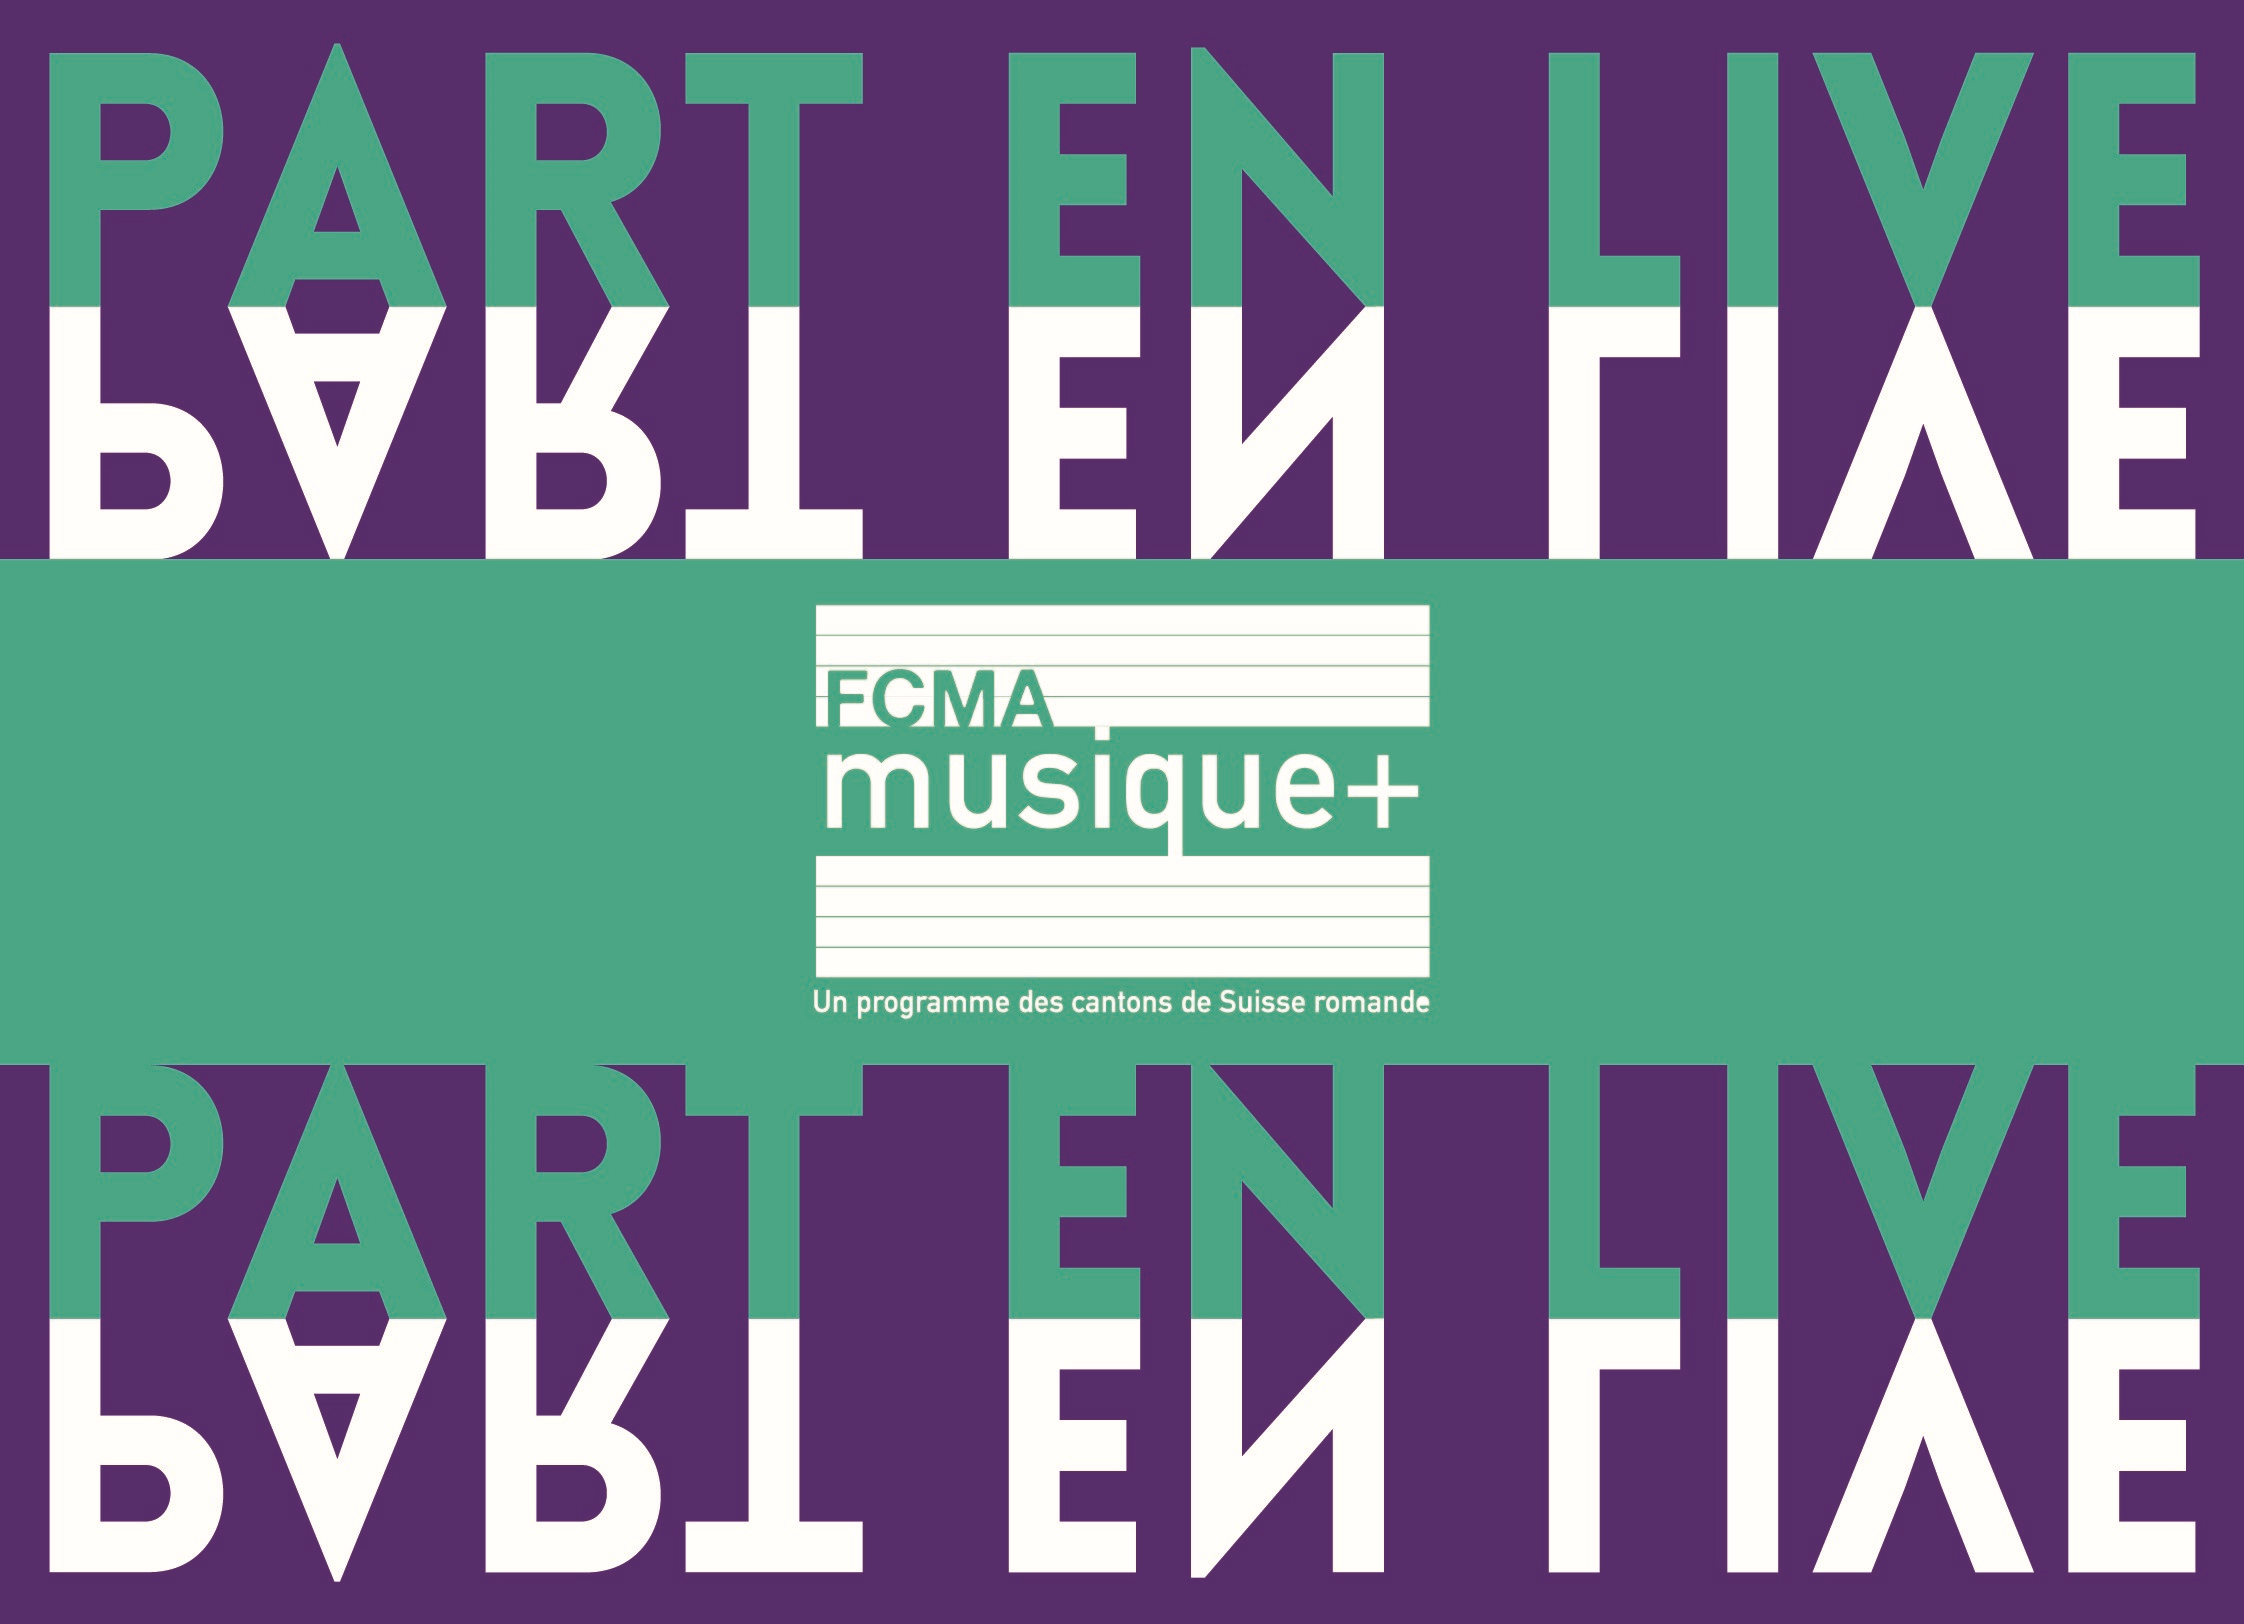 Visuel musiqur + – crédit KANULART